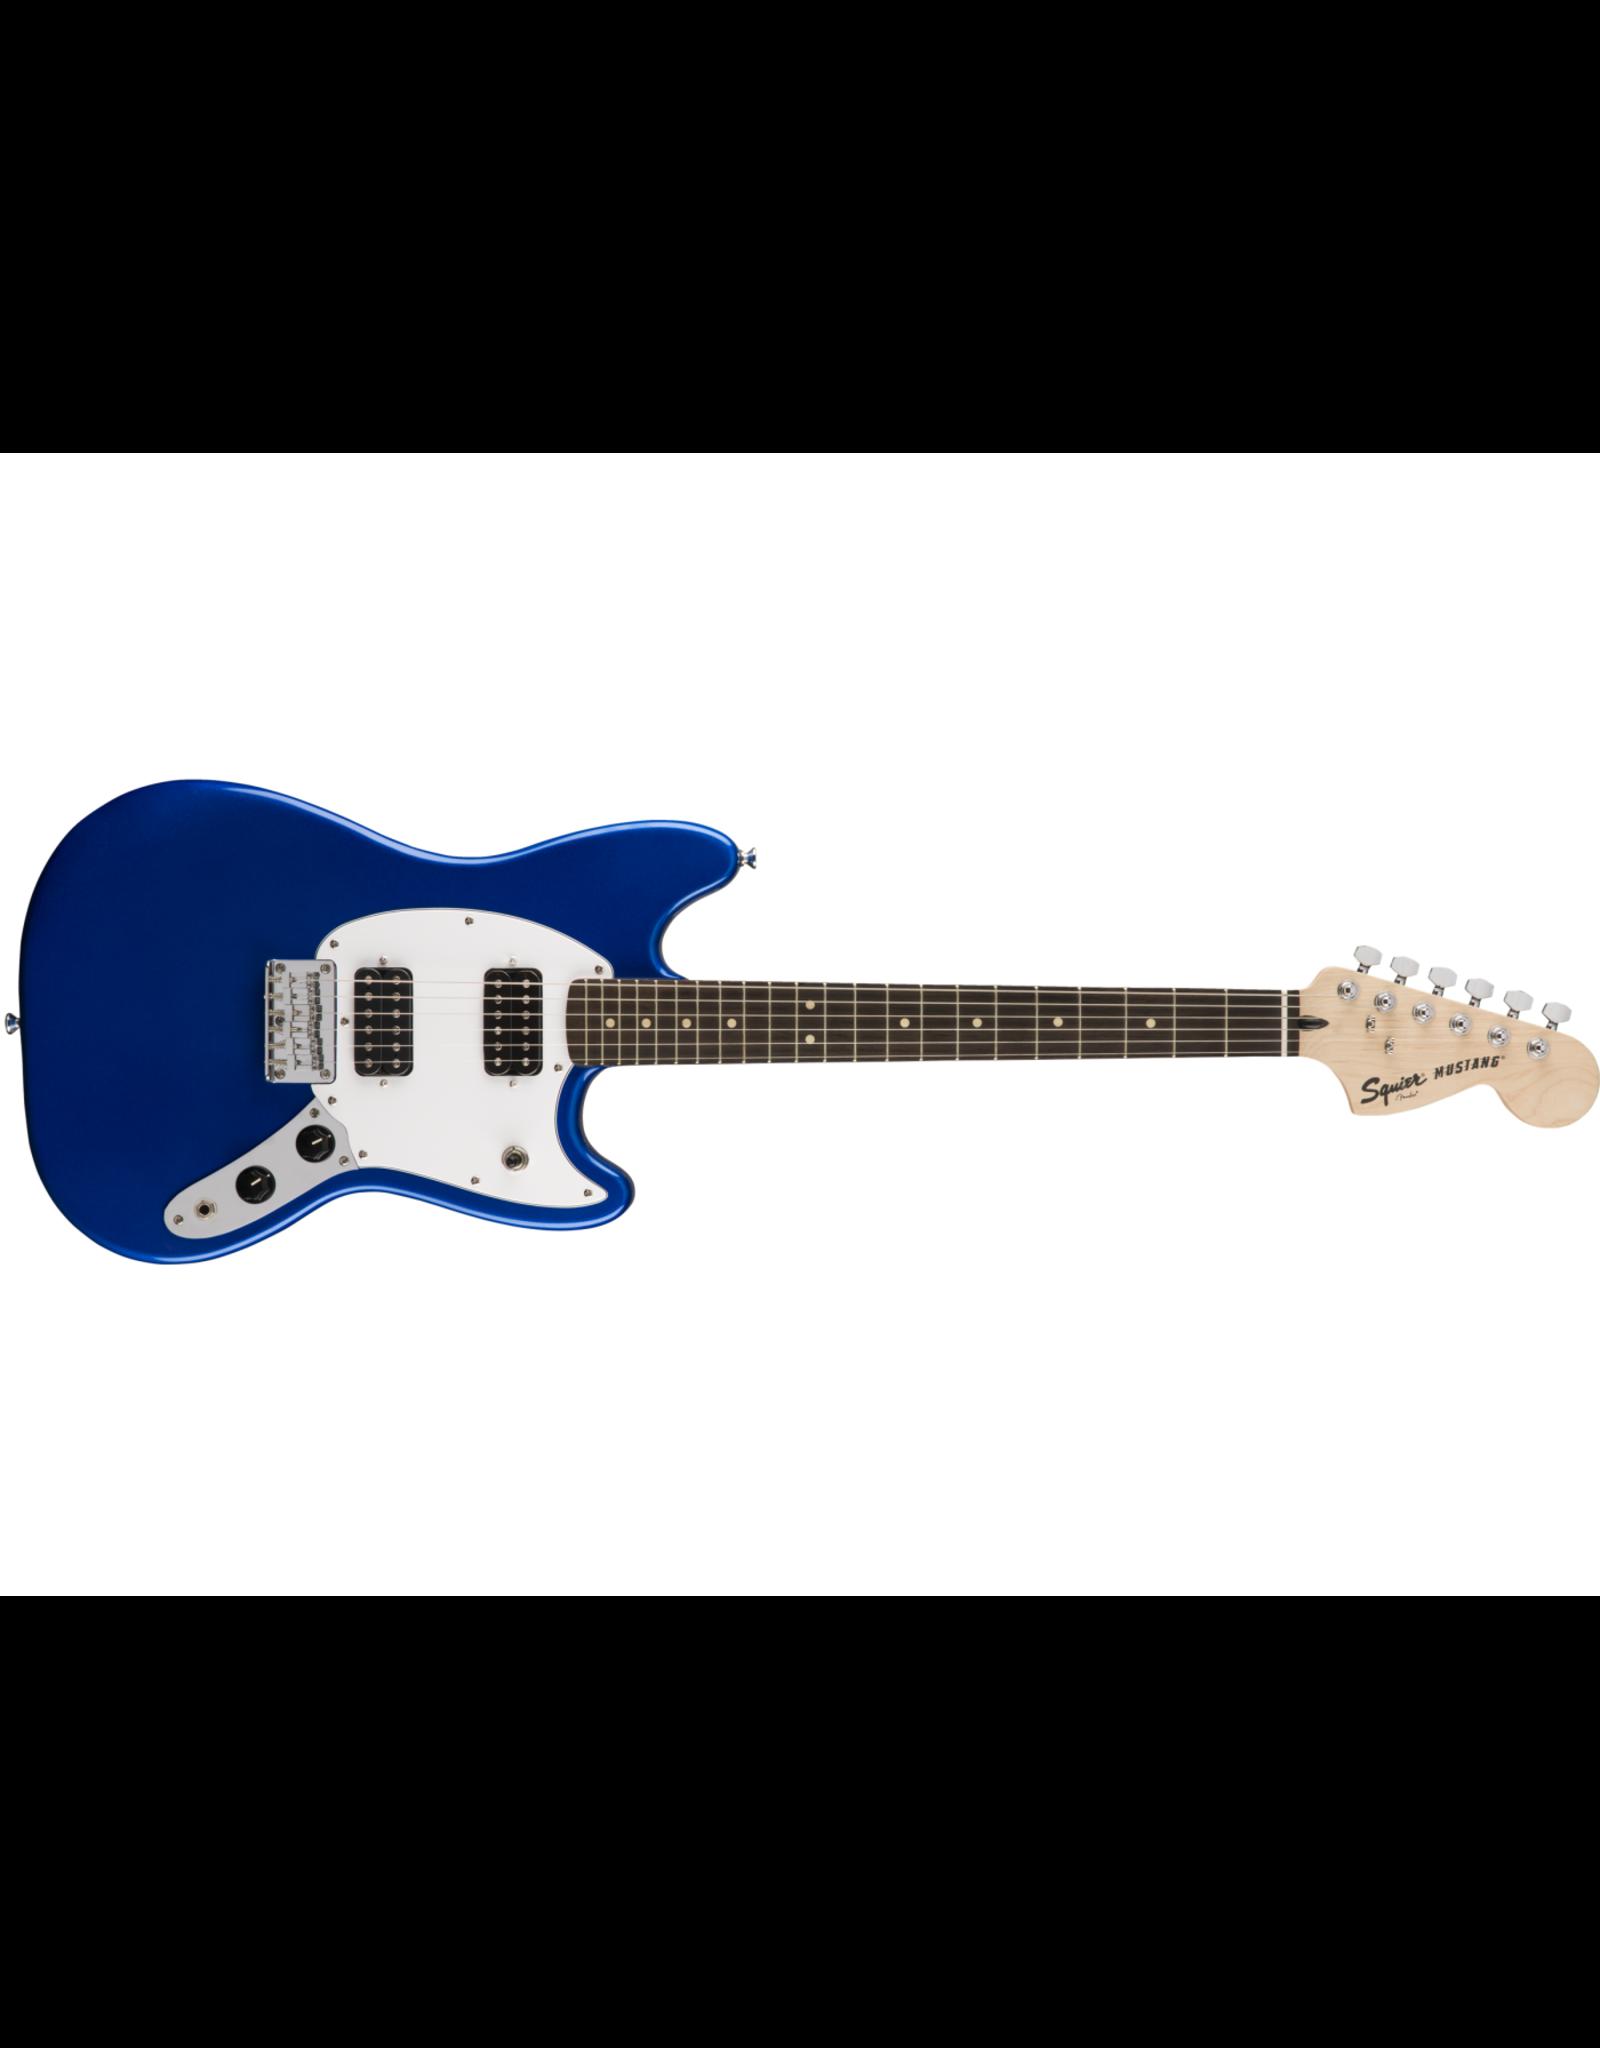 Fender Fender Squier Bullet Mustang HH Imperial Blue